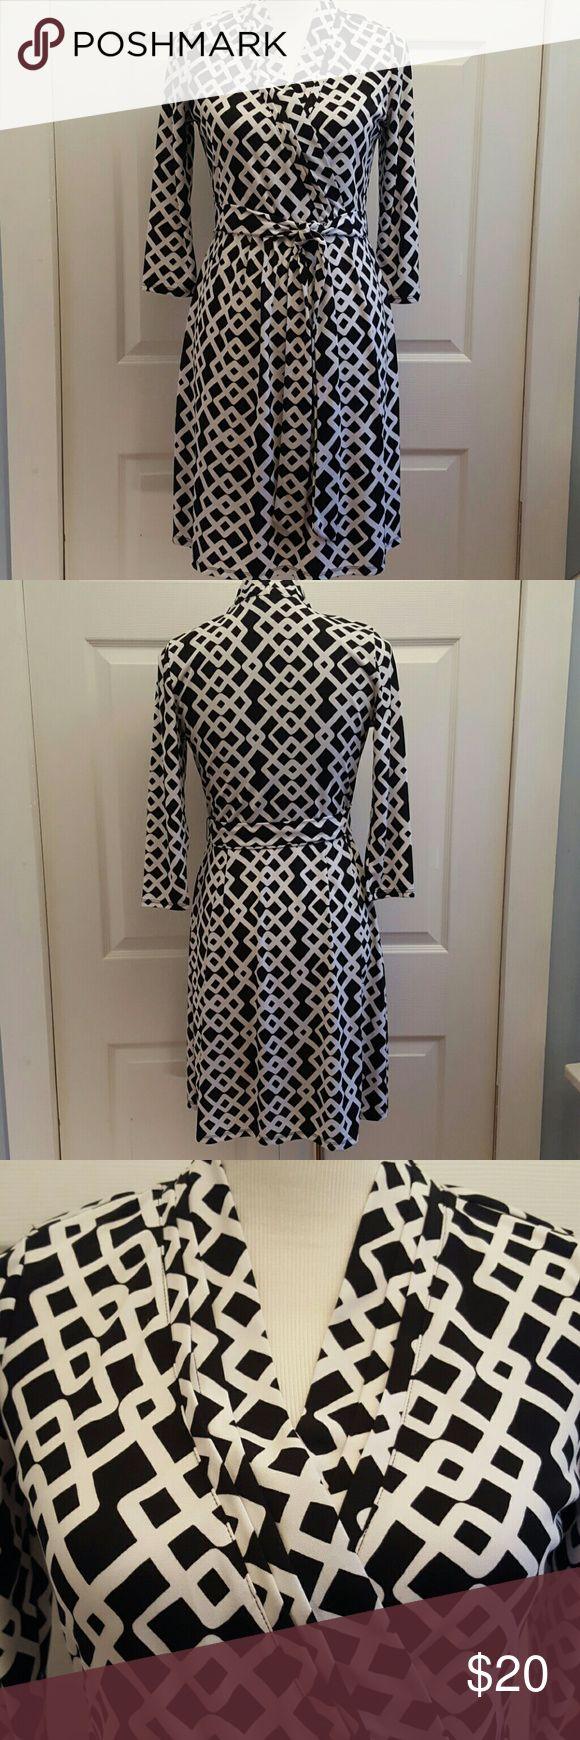 Liz Claiborne Dress Very good condition. Liz Claiborne Dresses